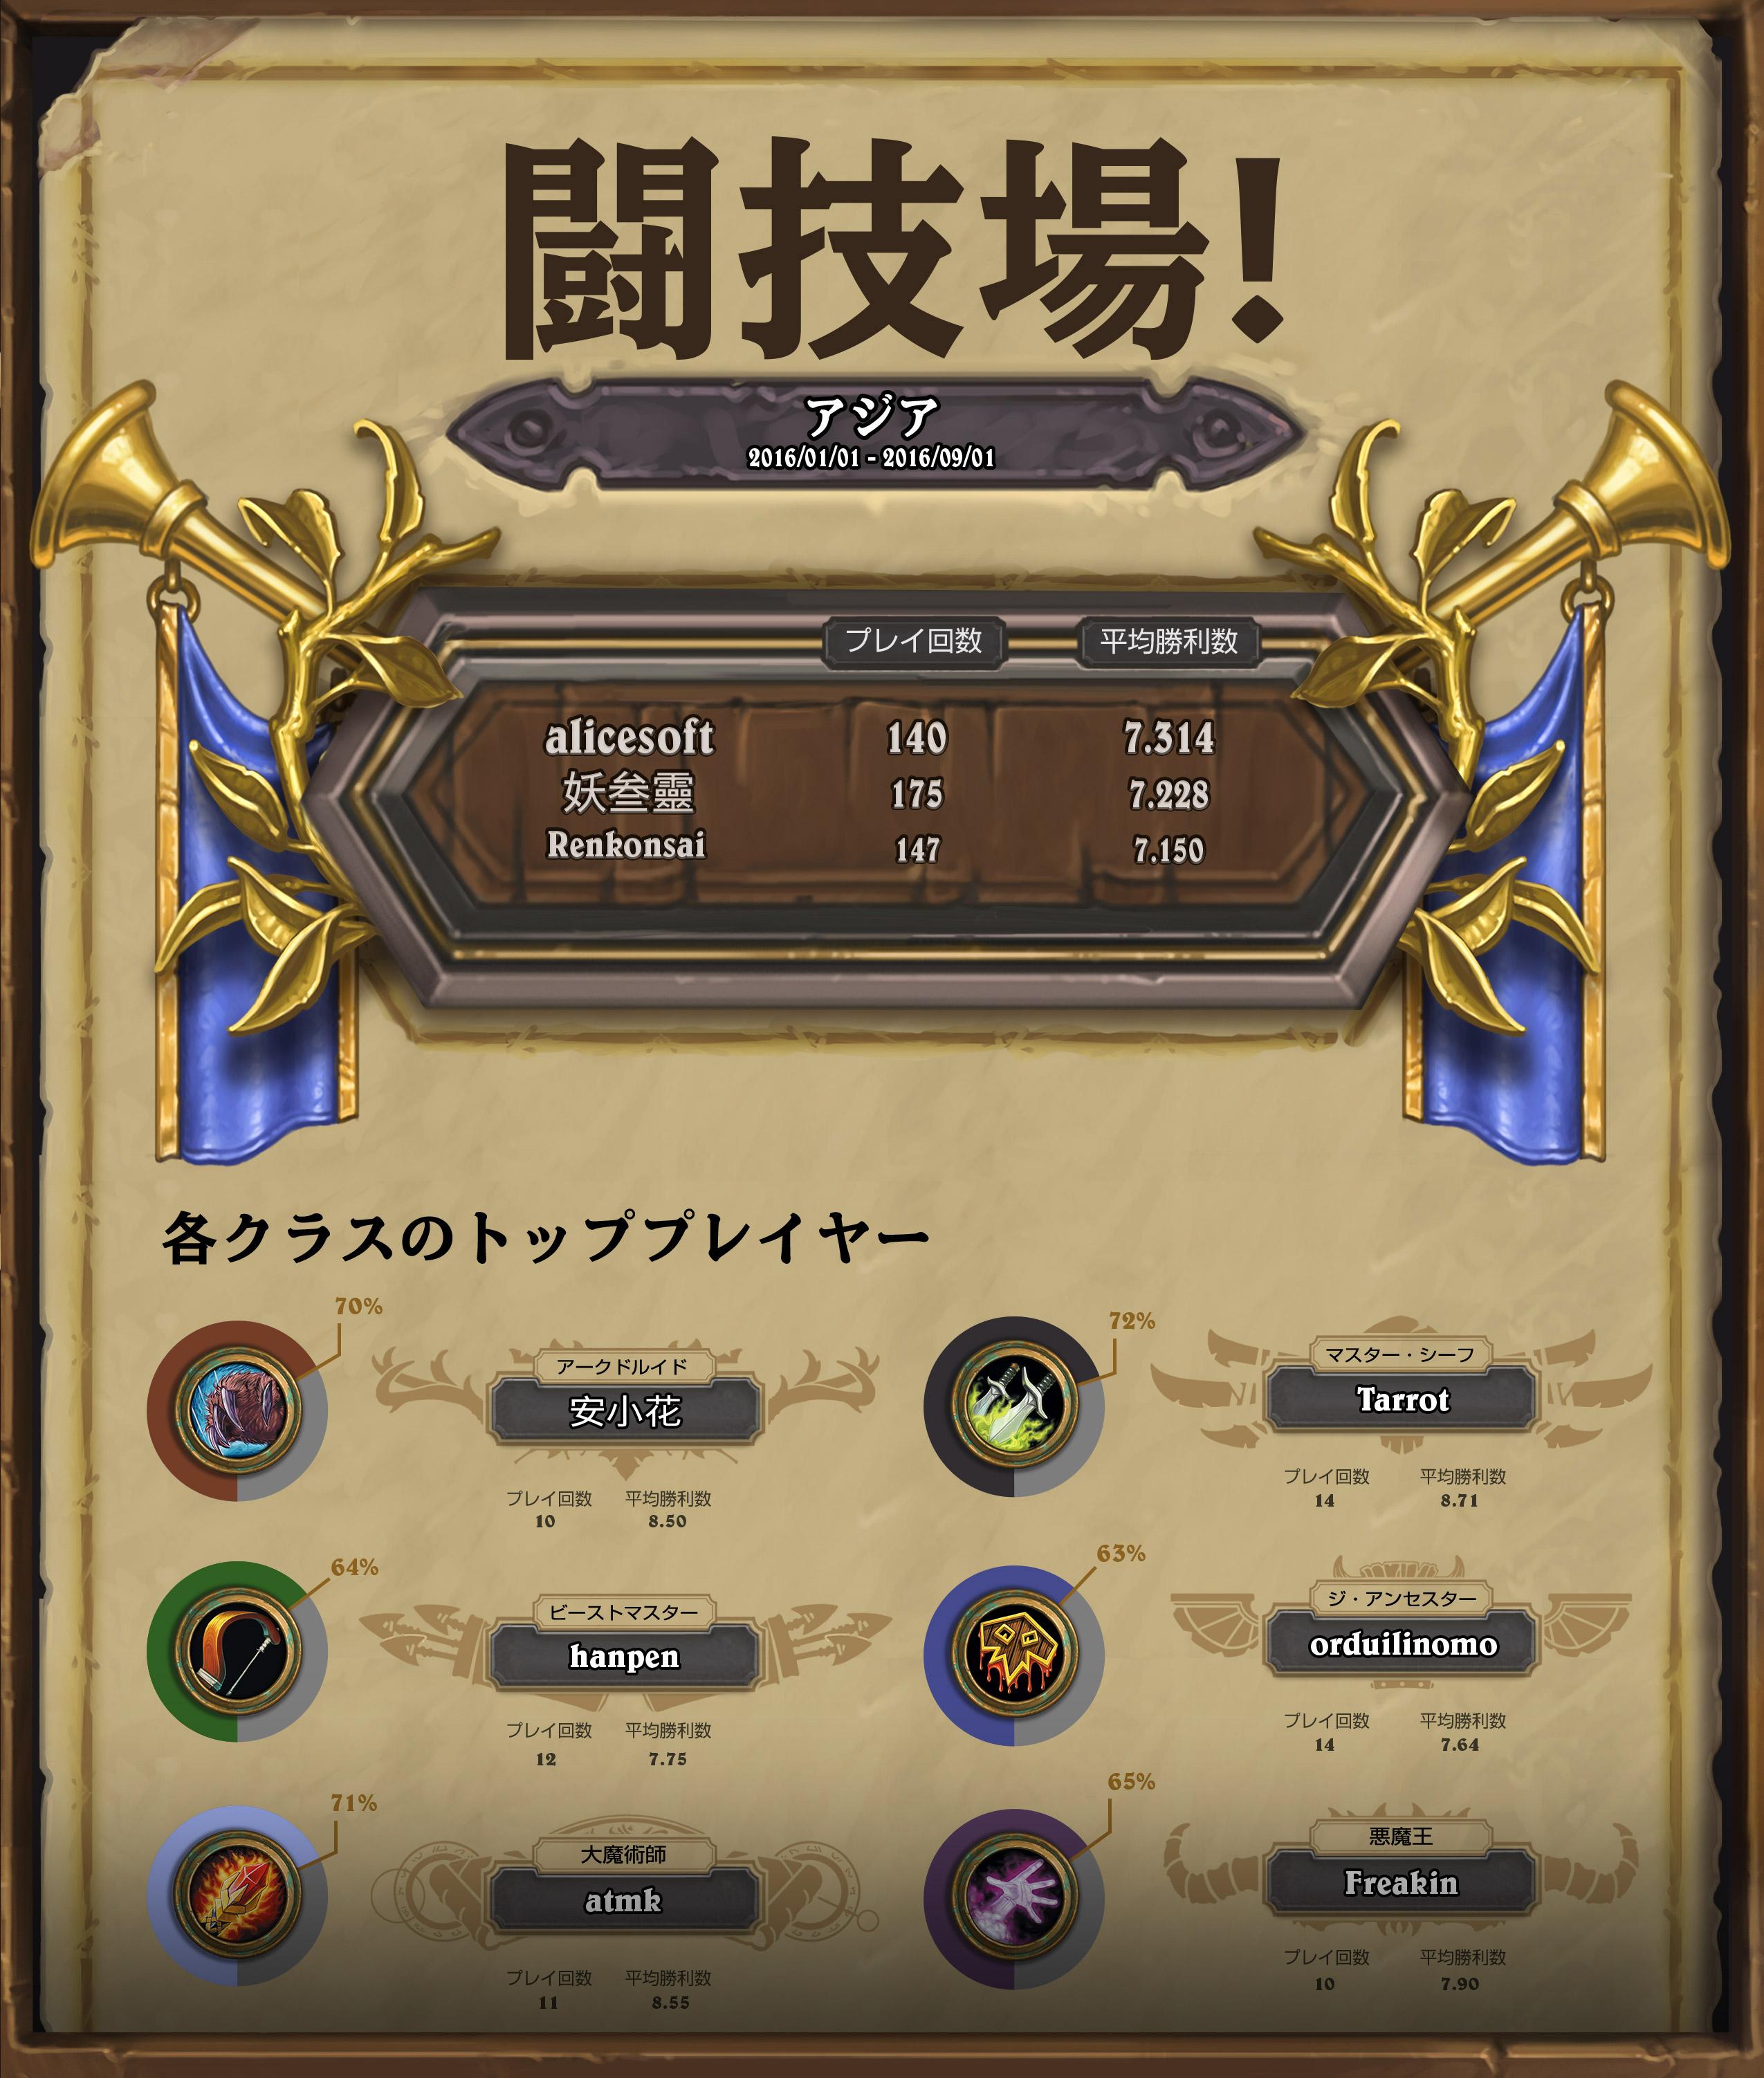 Asia Arena Infographic